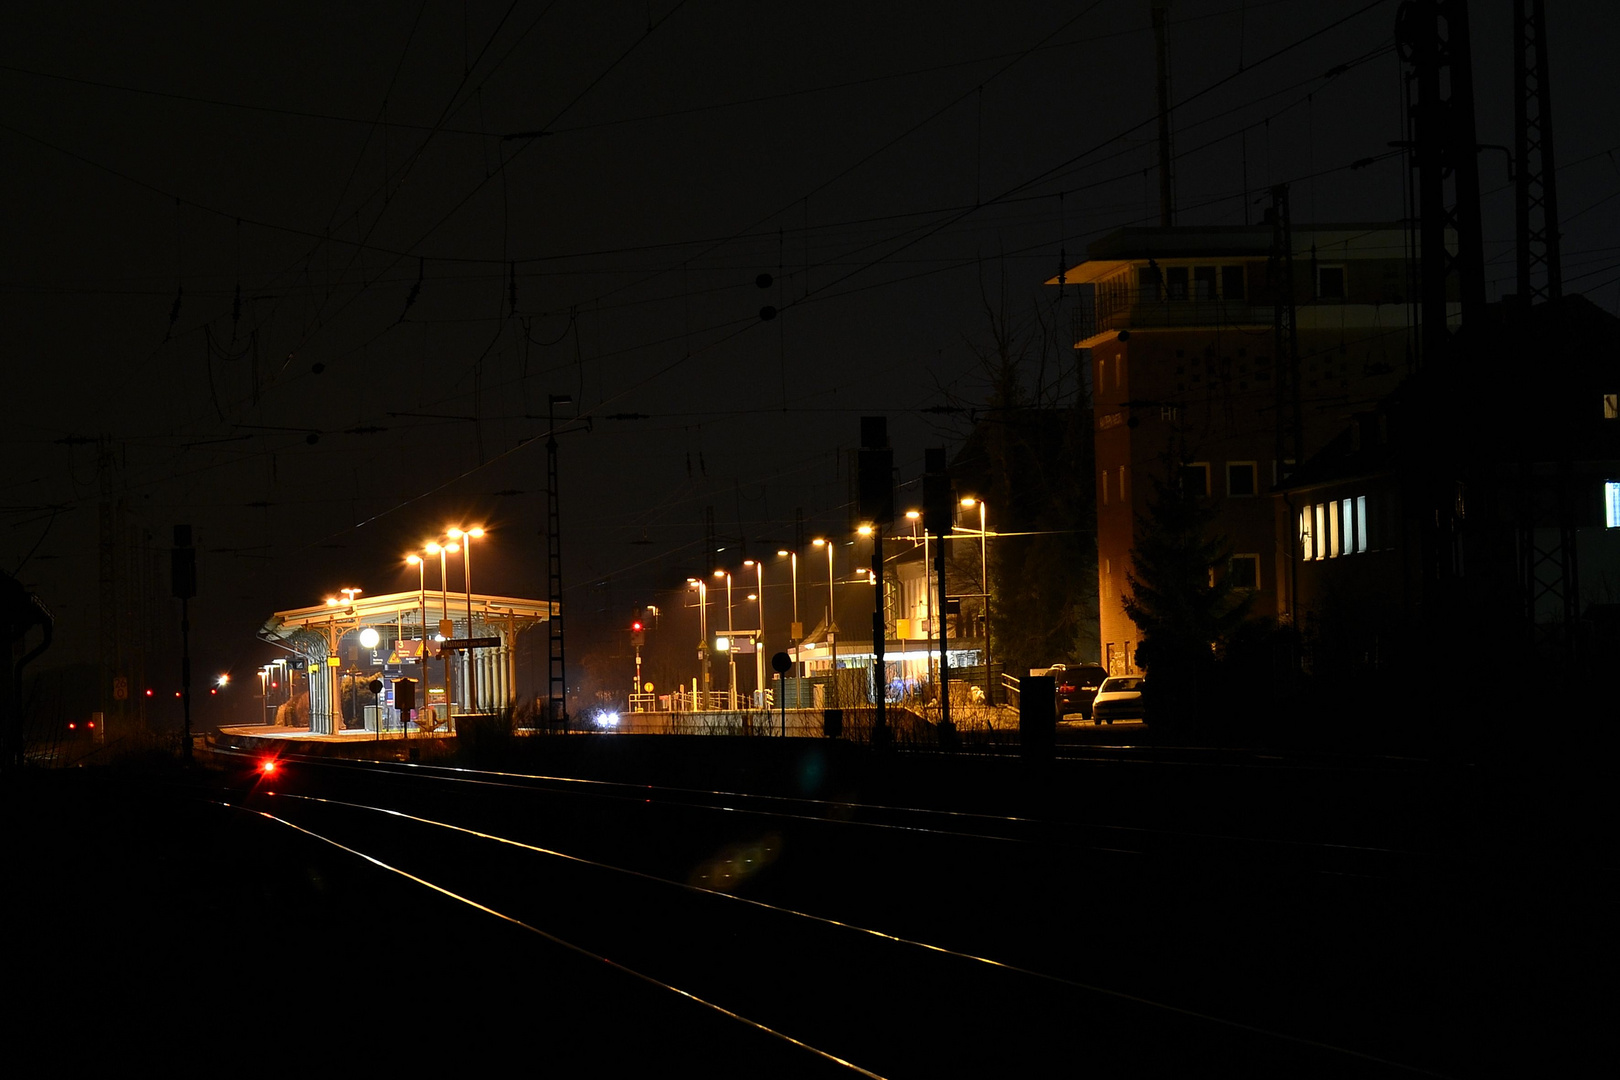 Bahnhof Haltern